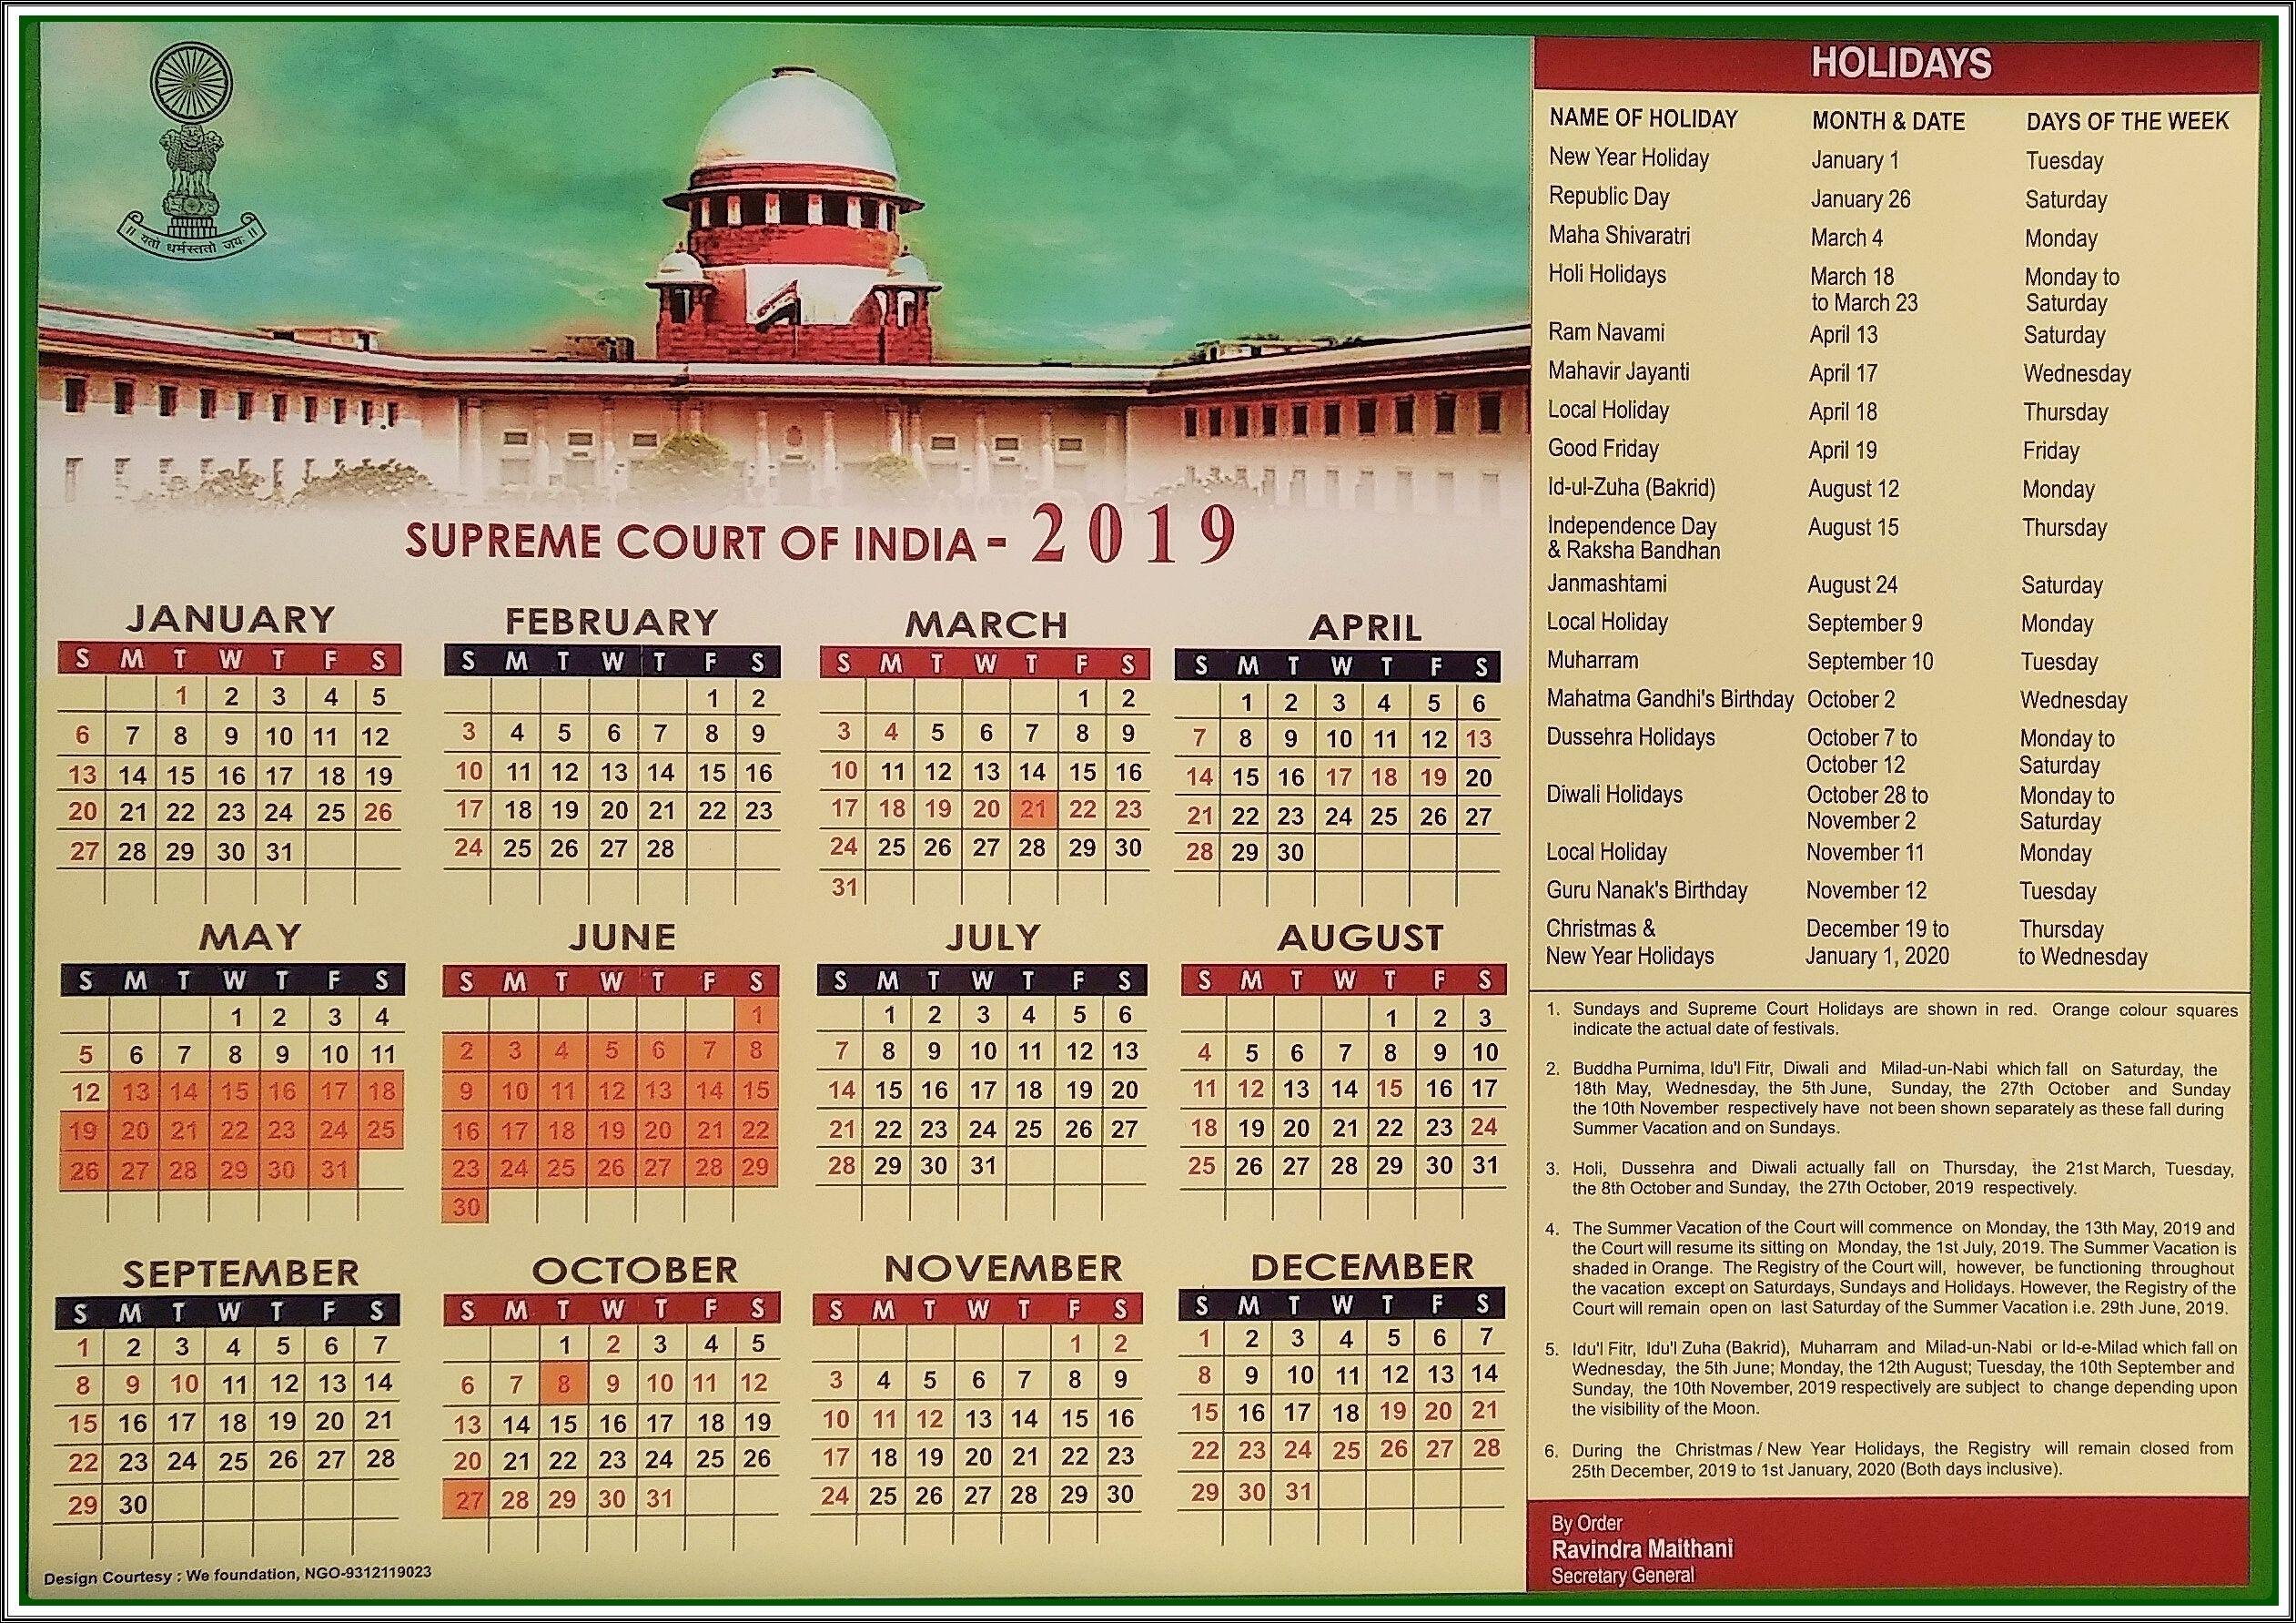 Exceptional 2020 Calendar India Festival in 2020 | Calendar, Blank calendar  template, Holiday calendar